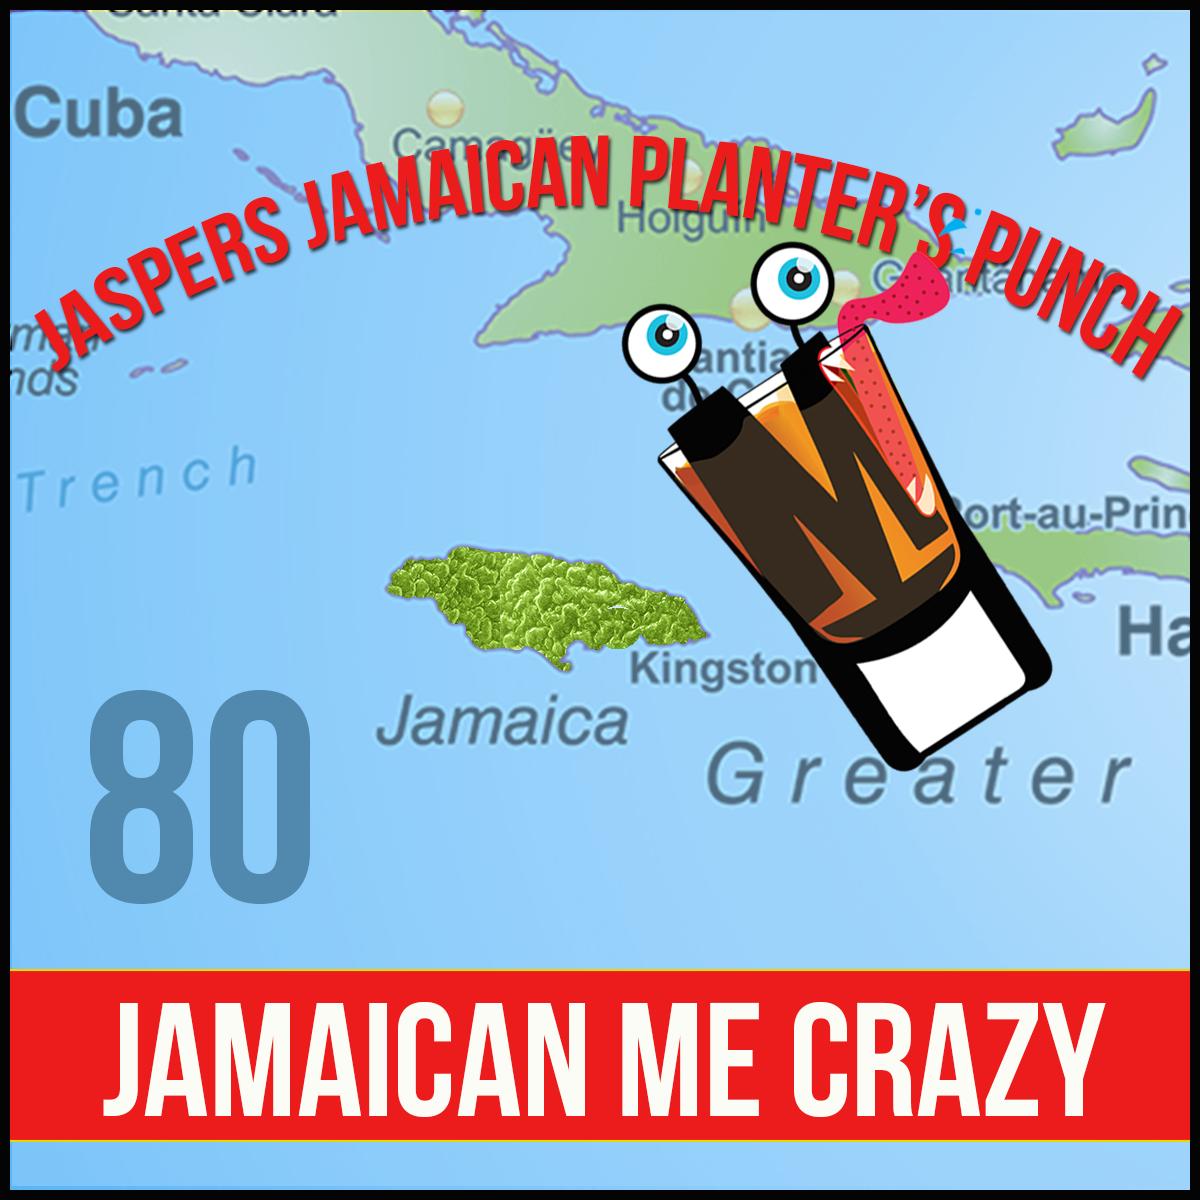 Jasper's Jamaican Planter's Punch podcast